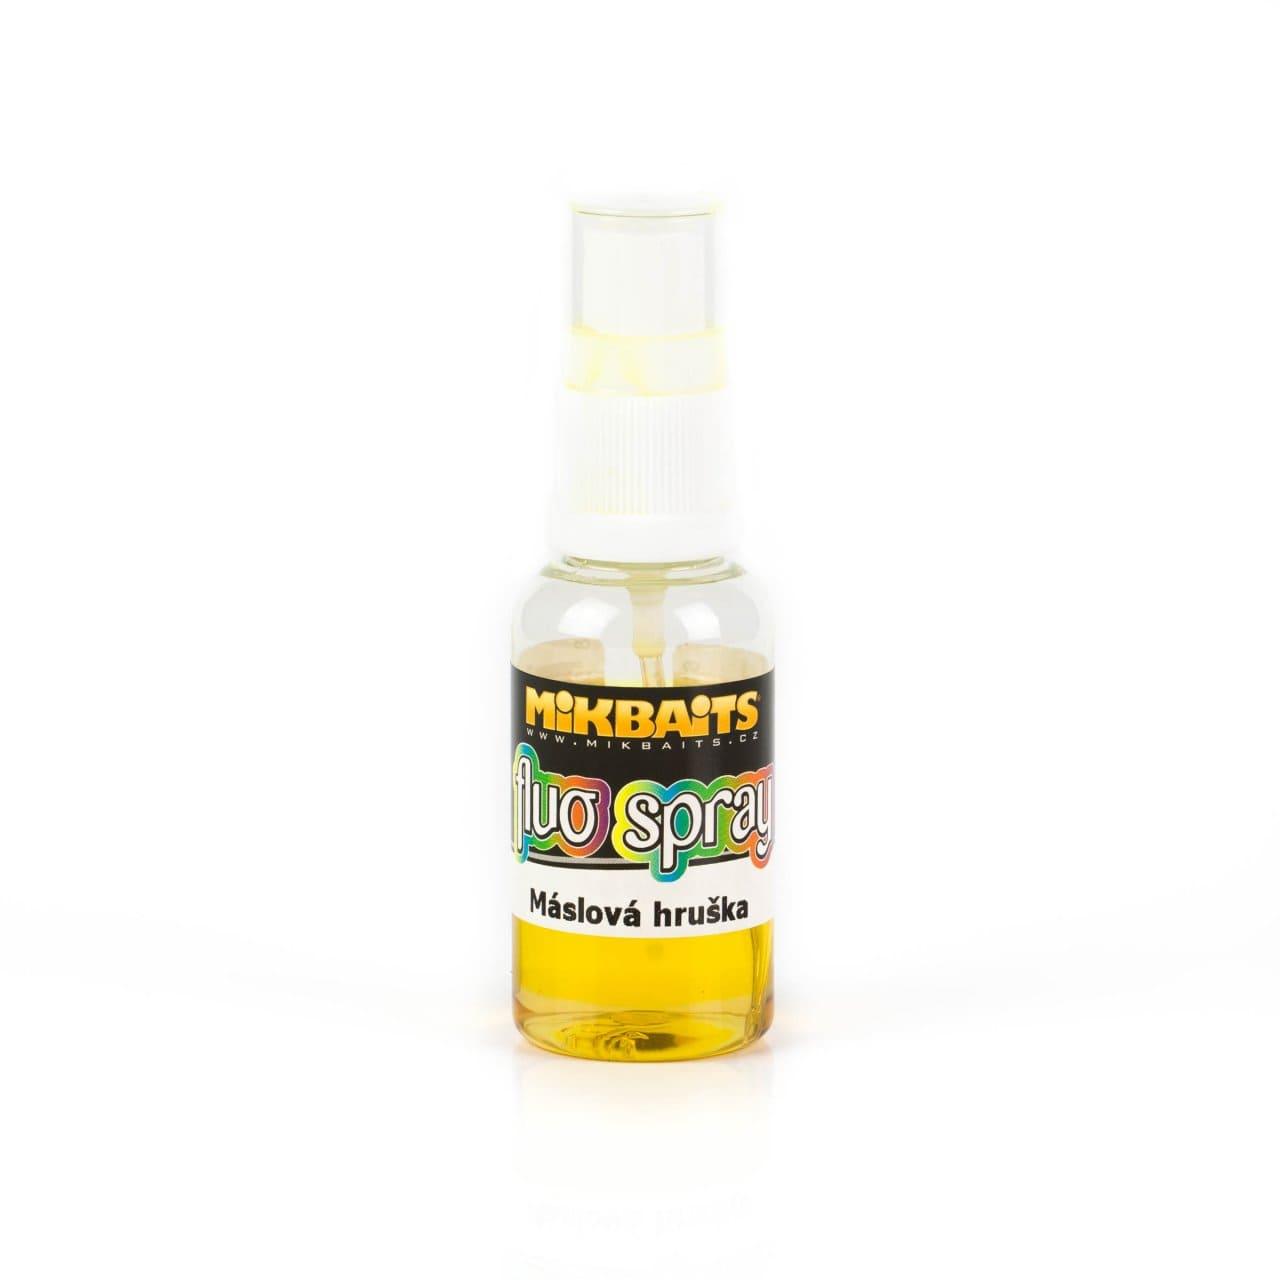 Mikbaits Pop-up spray 30ml